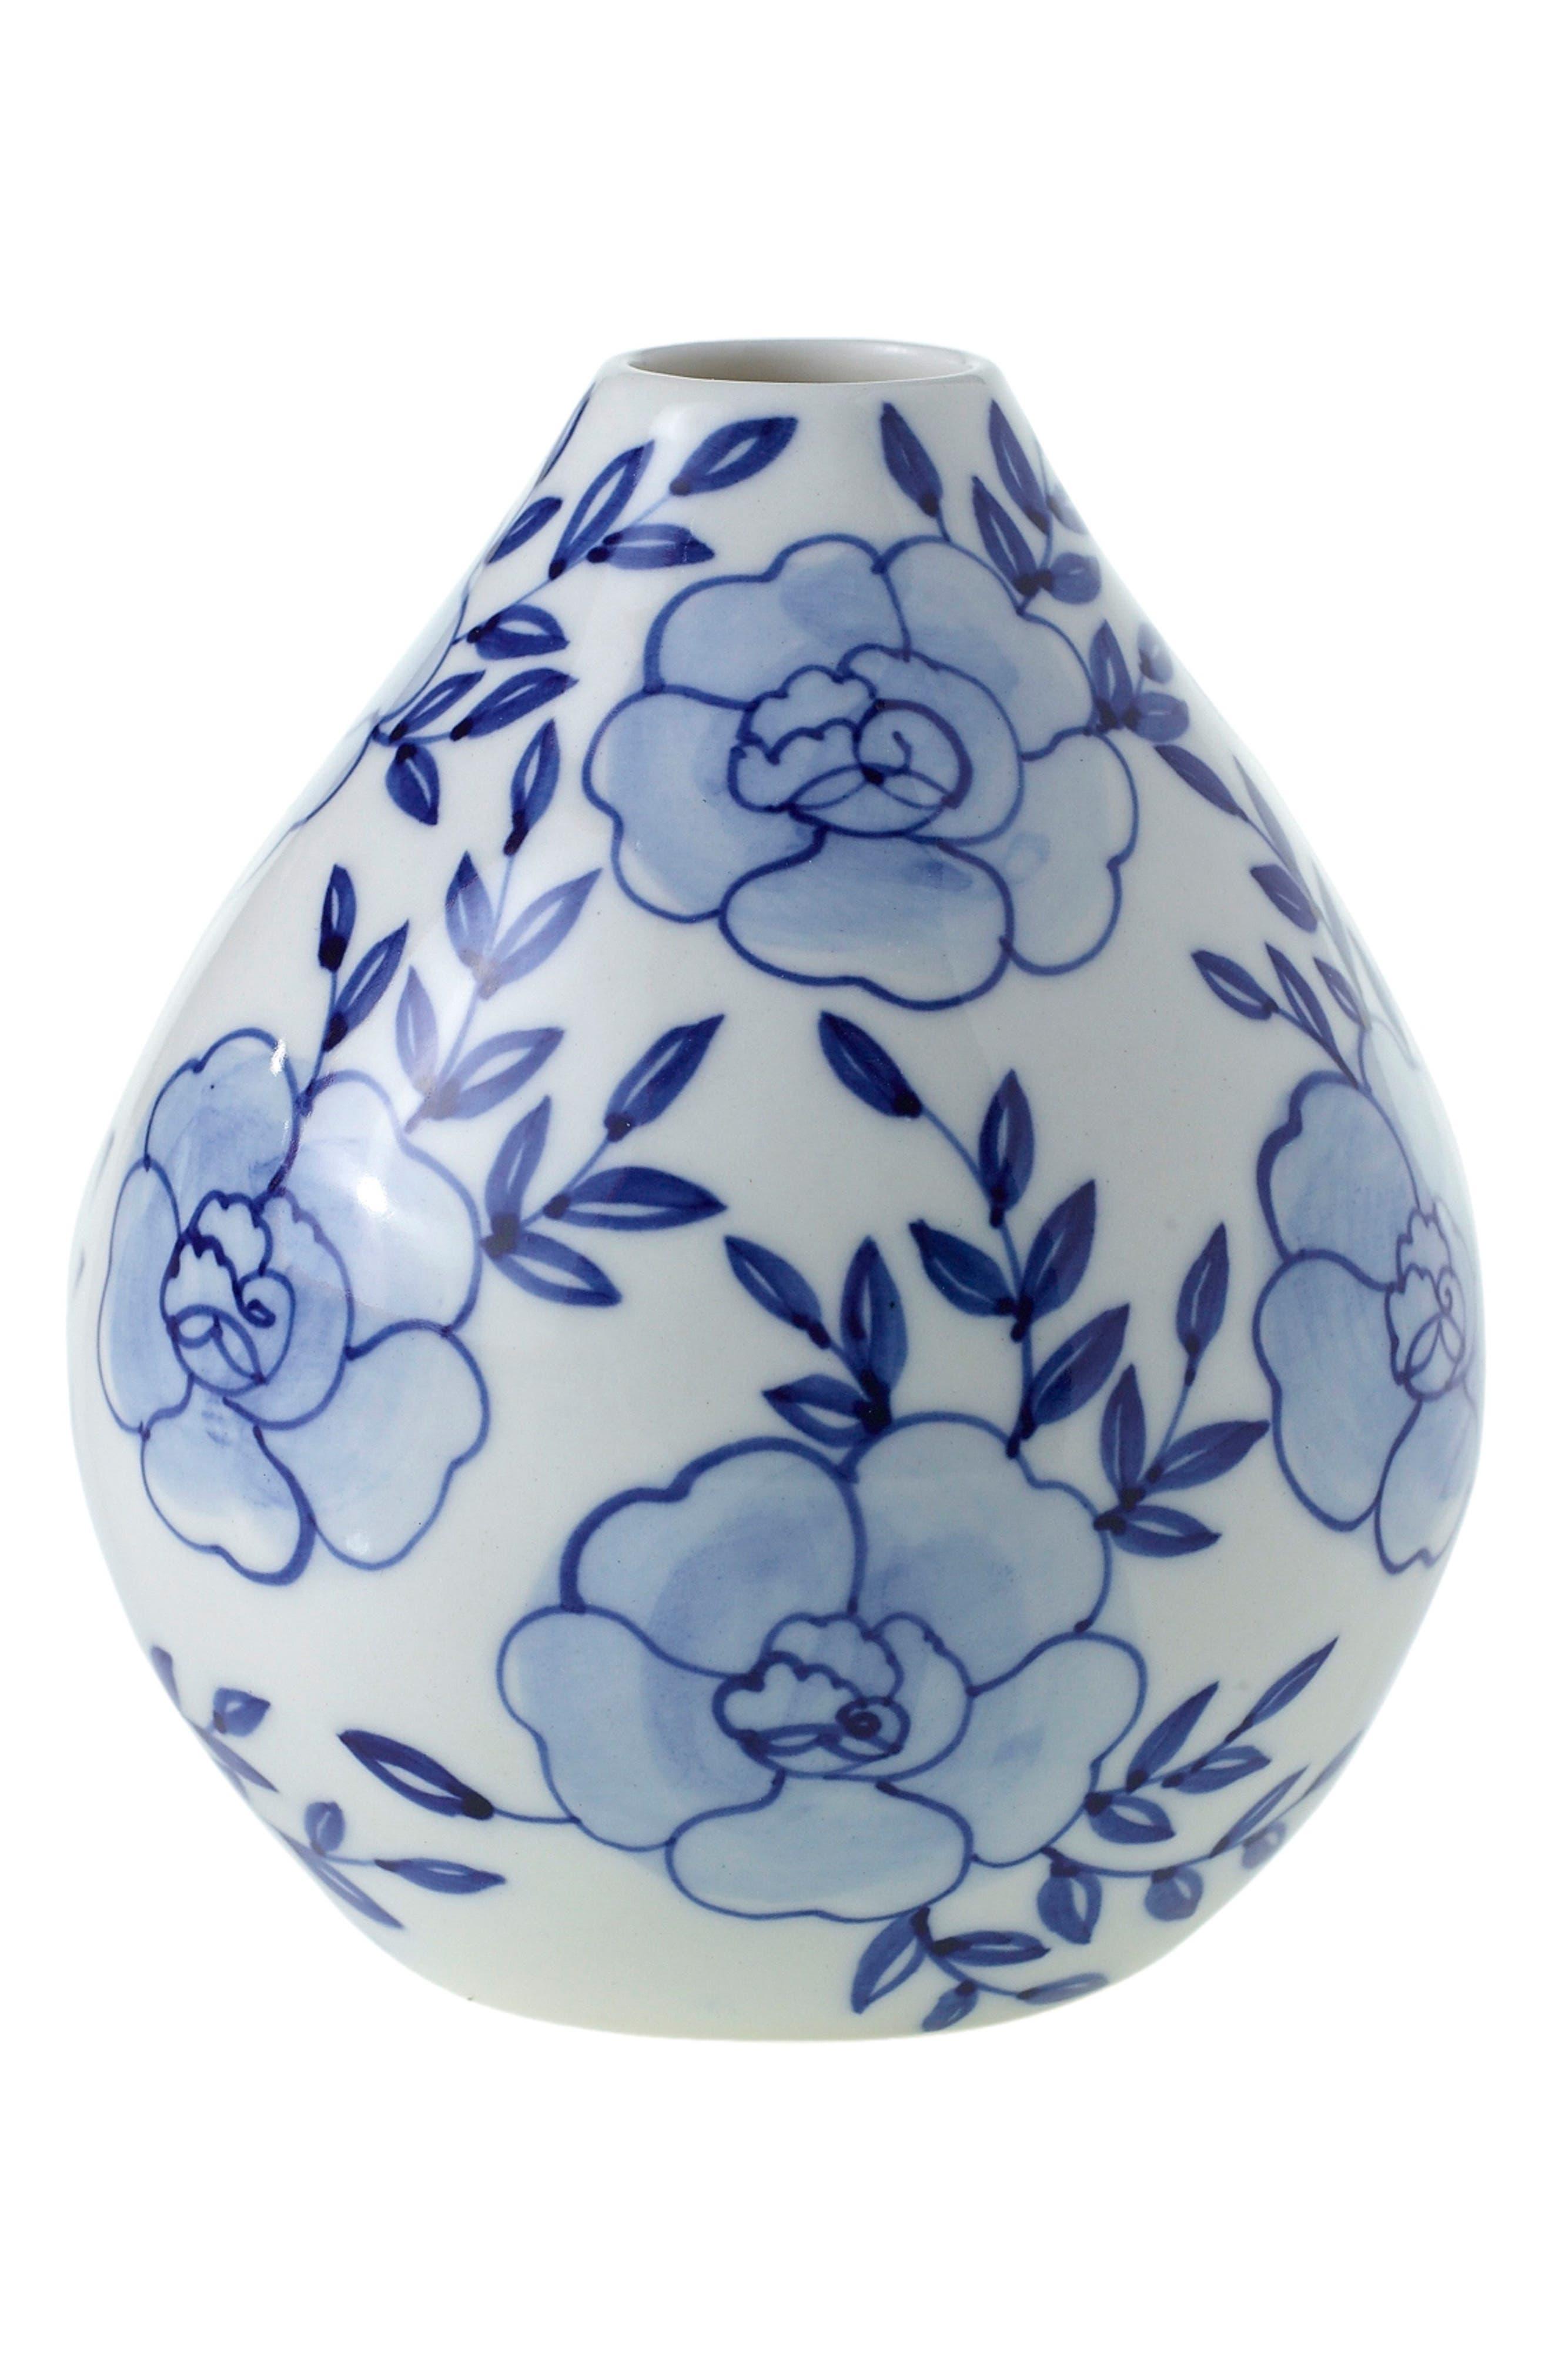 Eleanor Hand Painted Ceramic Bud Vase,                         Main,                         color,